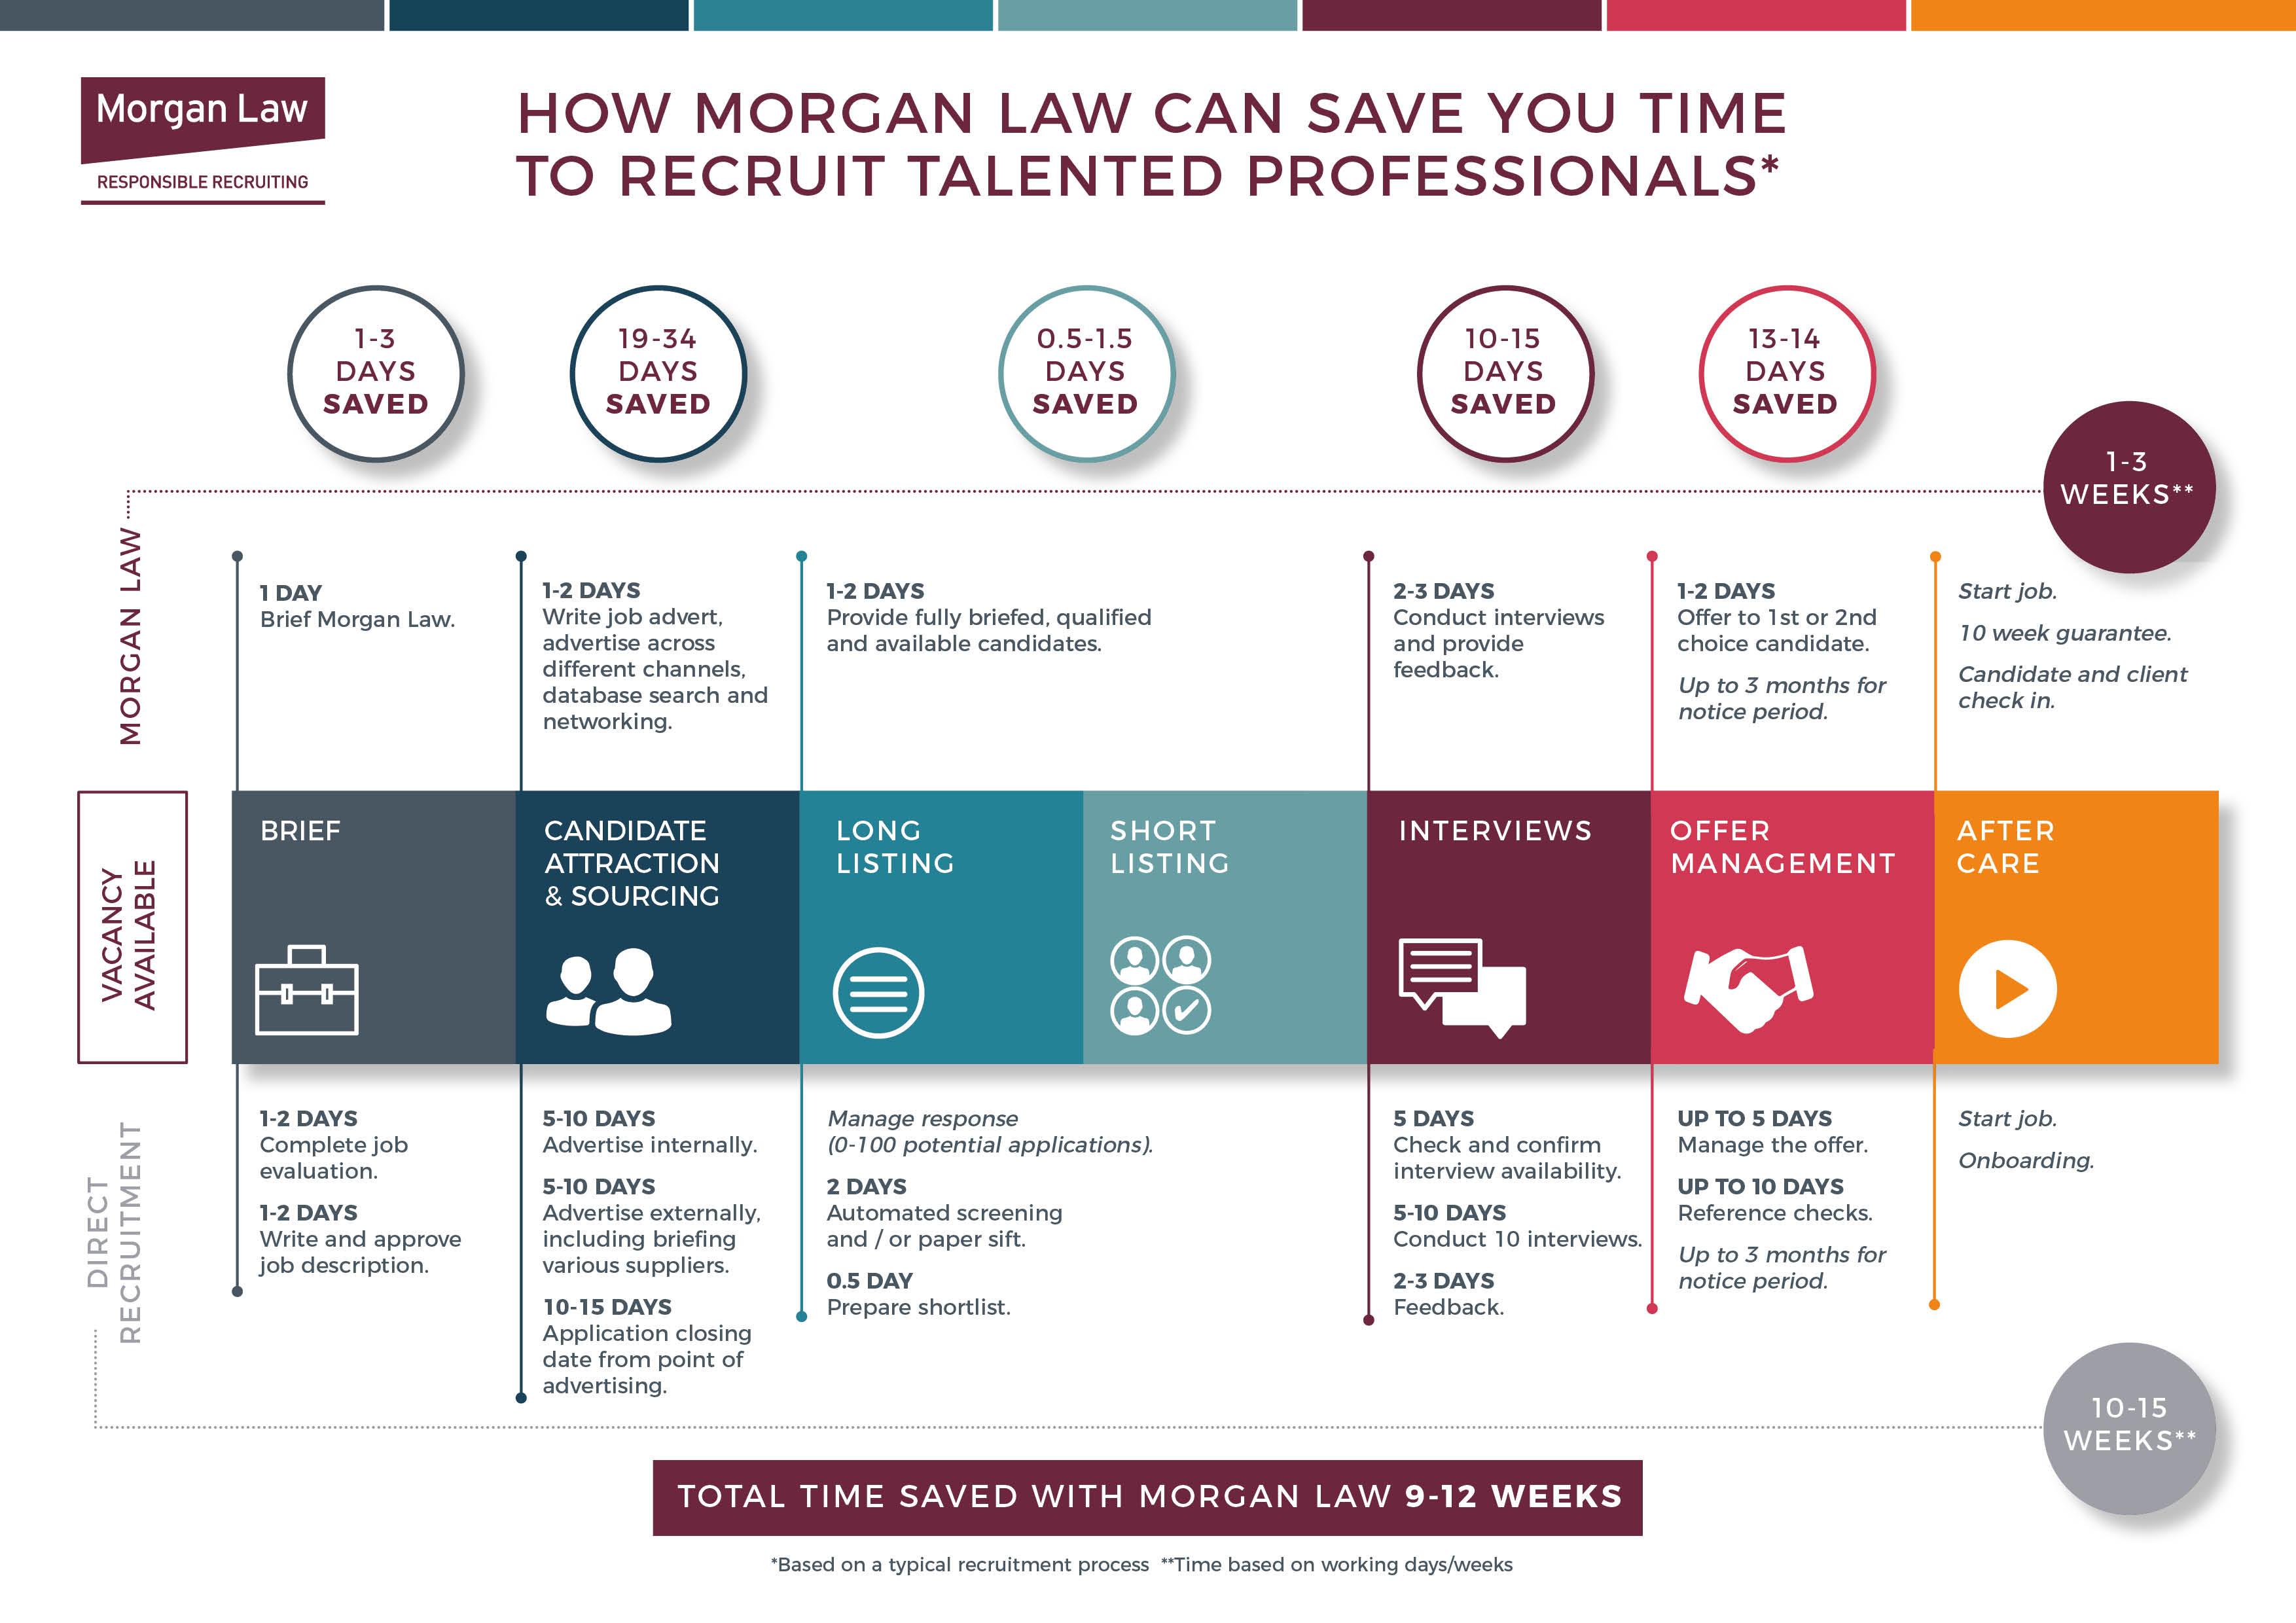 Morgan Law vs Direct Recruitment